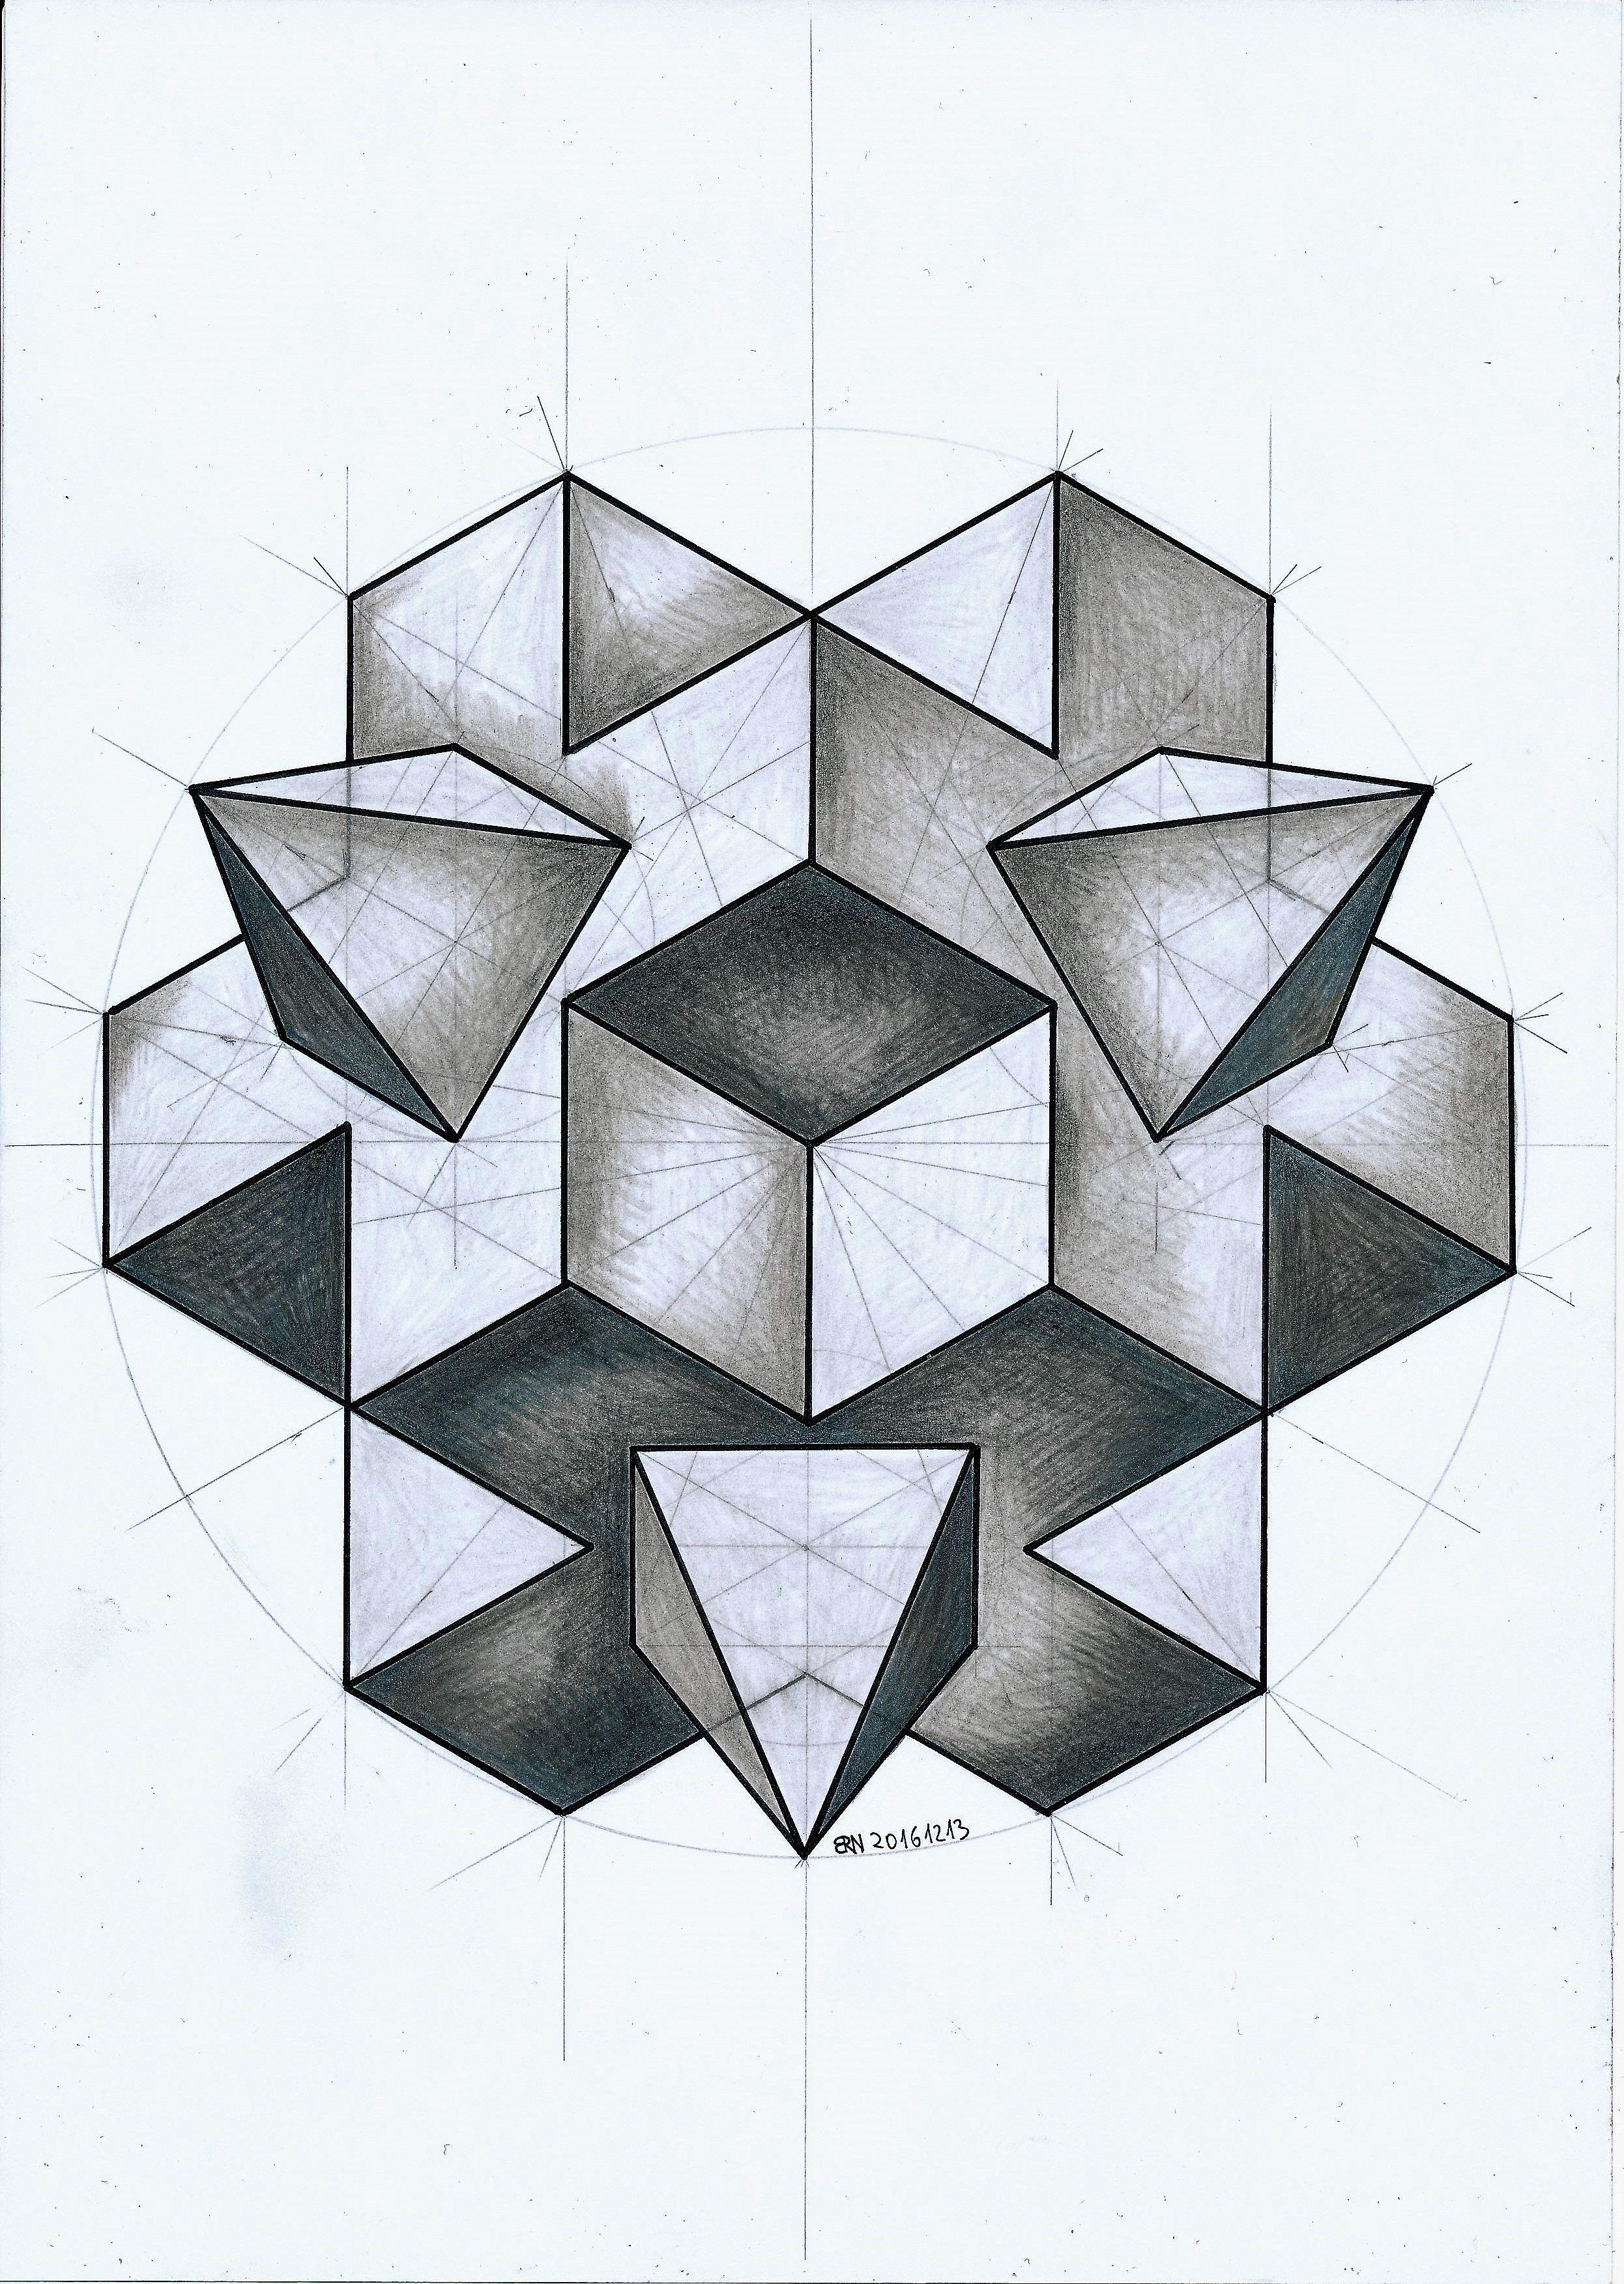 solid #polyhedra #geometry #symmetry #handmade #pencil